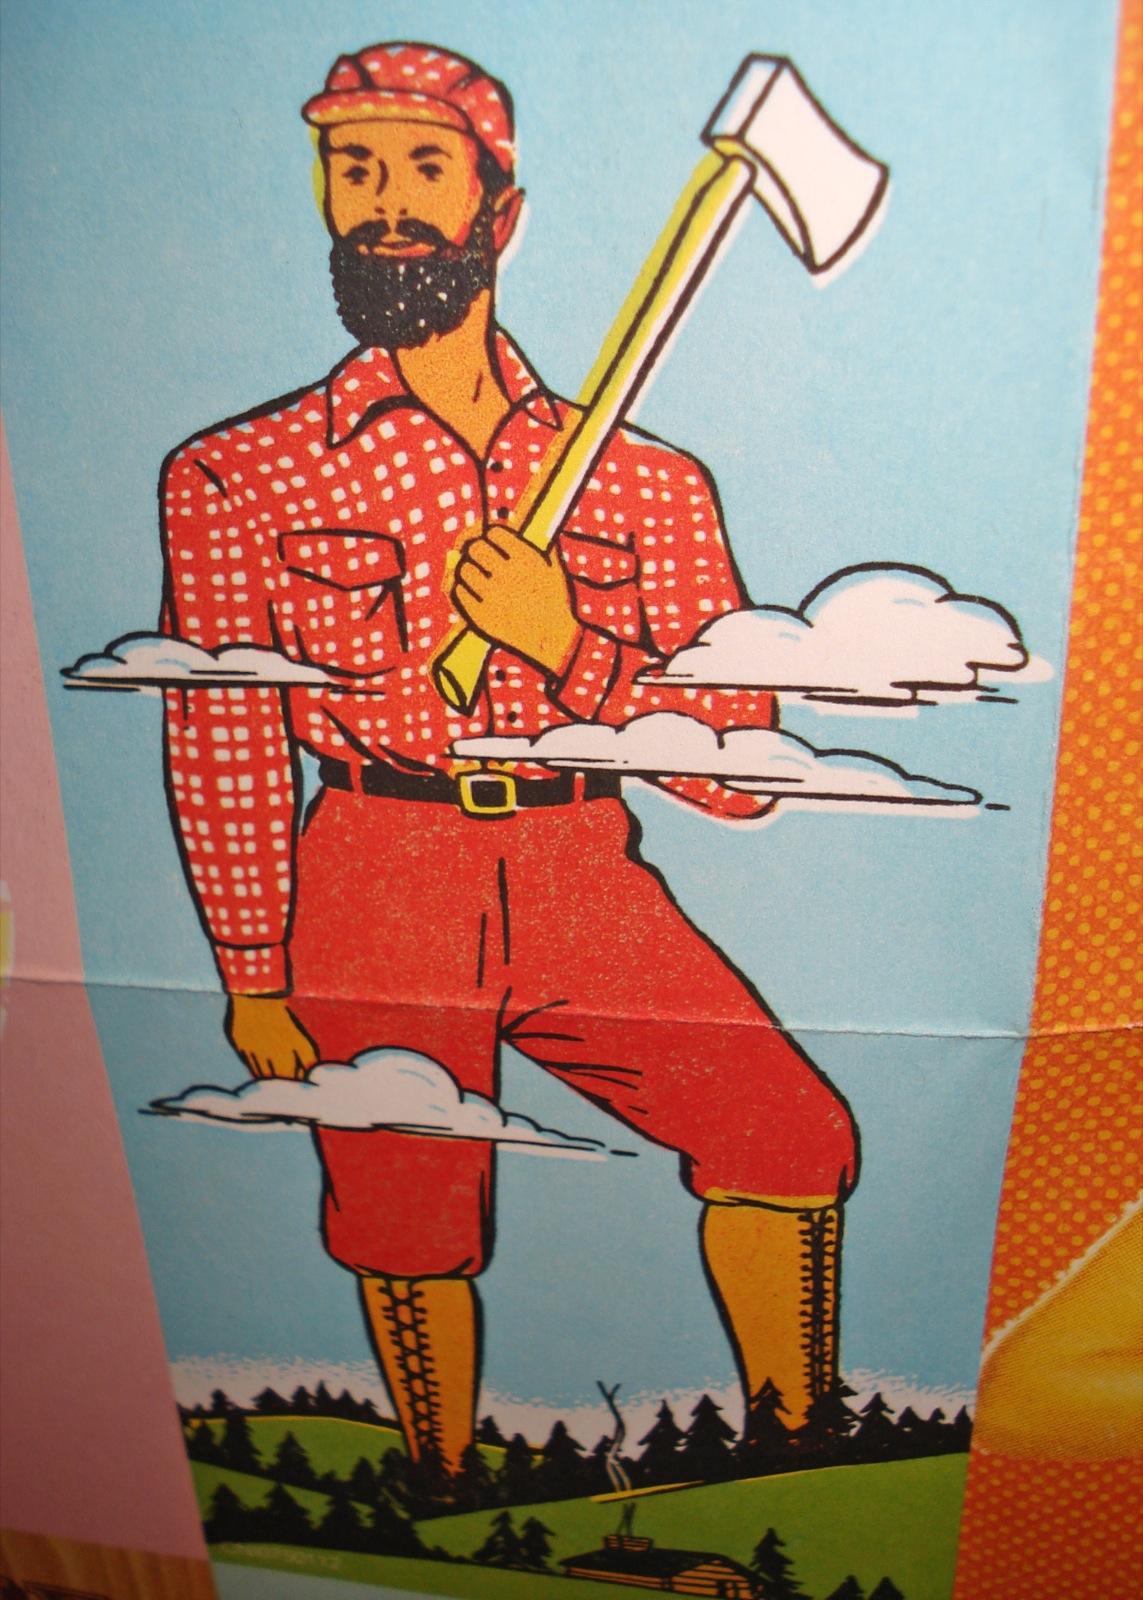 Free Paul Bunyan Download Free Clip Art Free Clip Art On